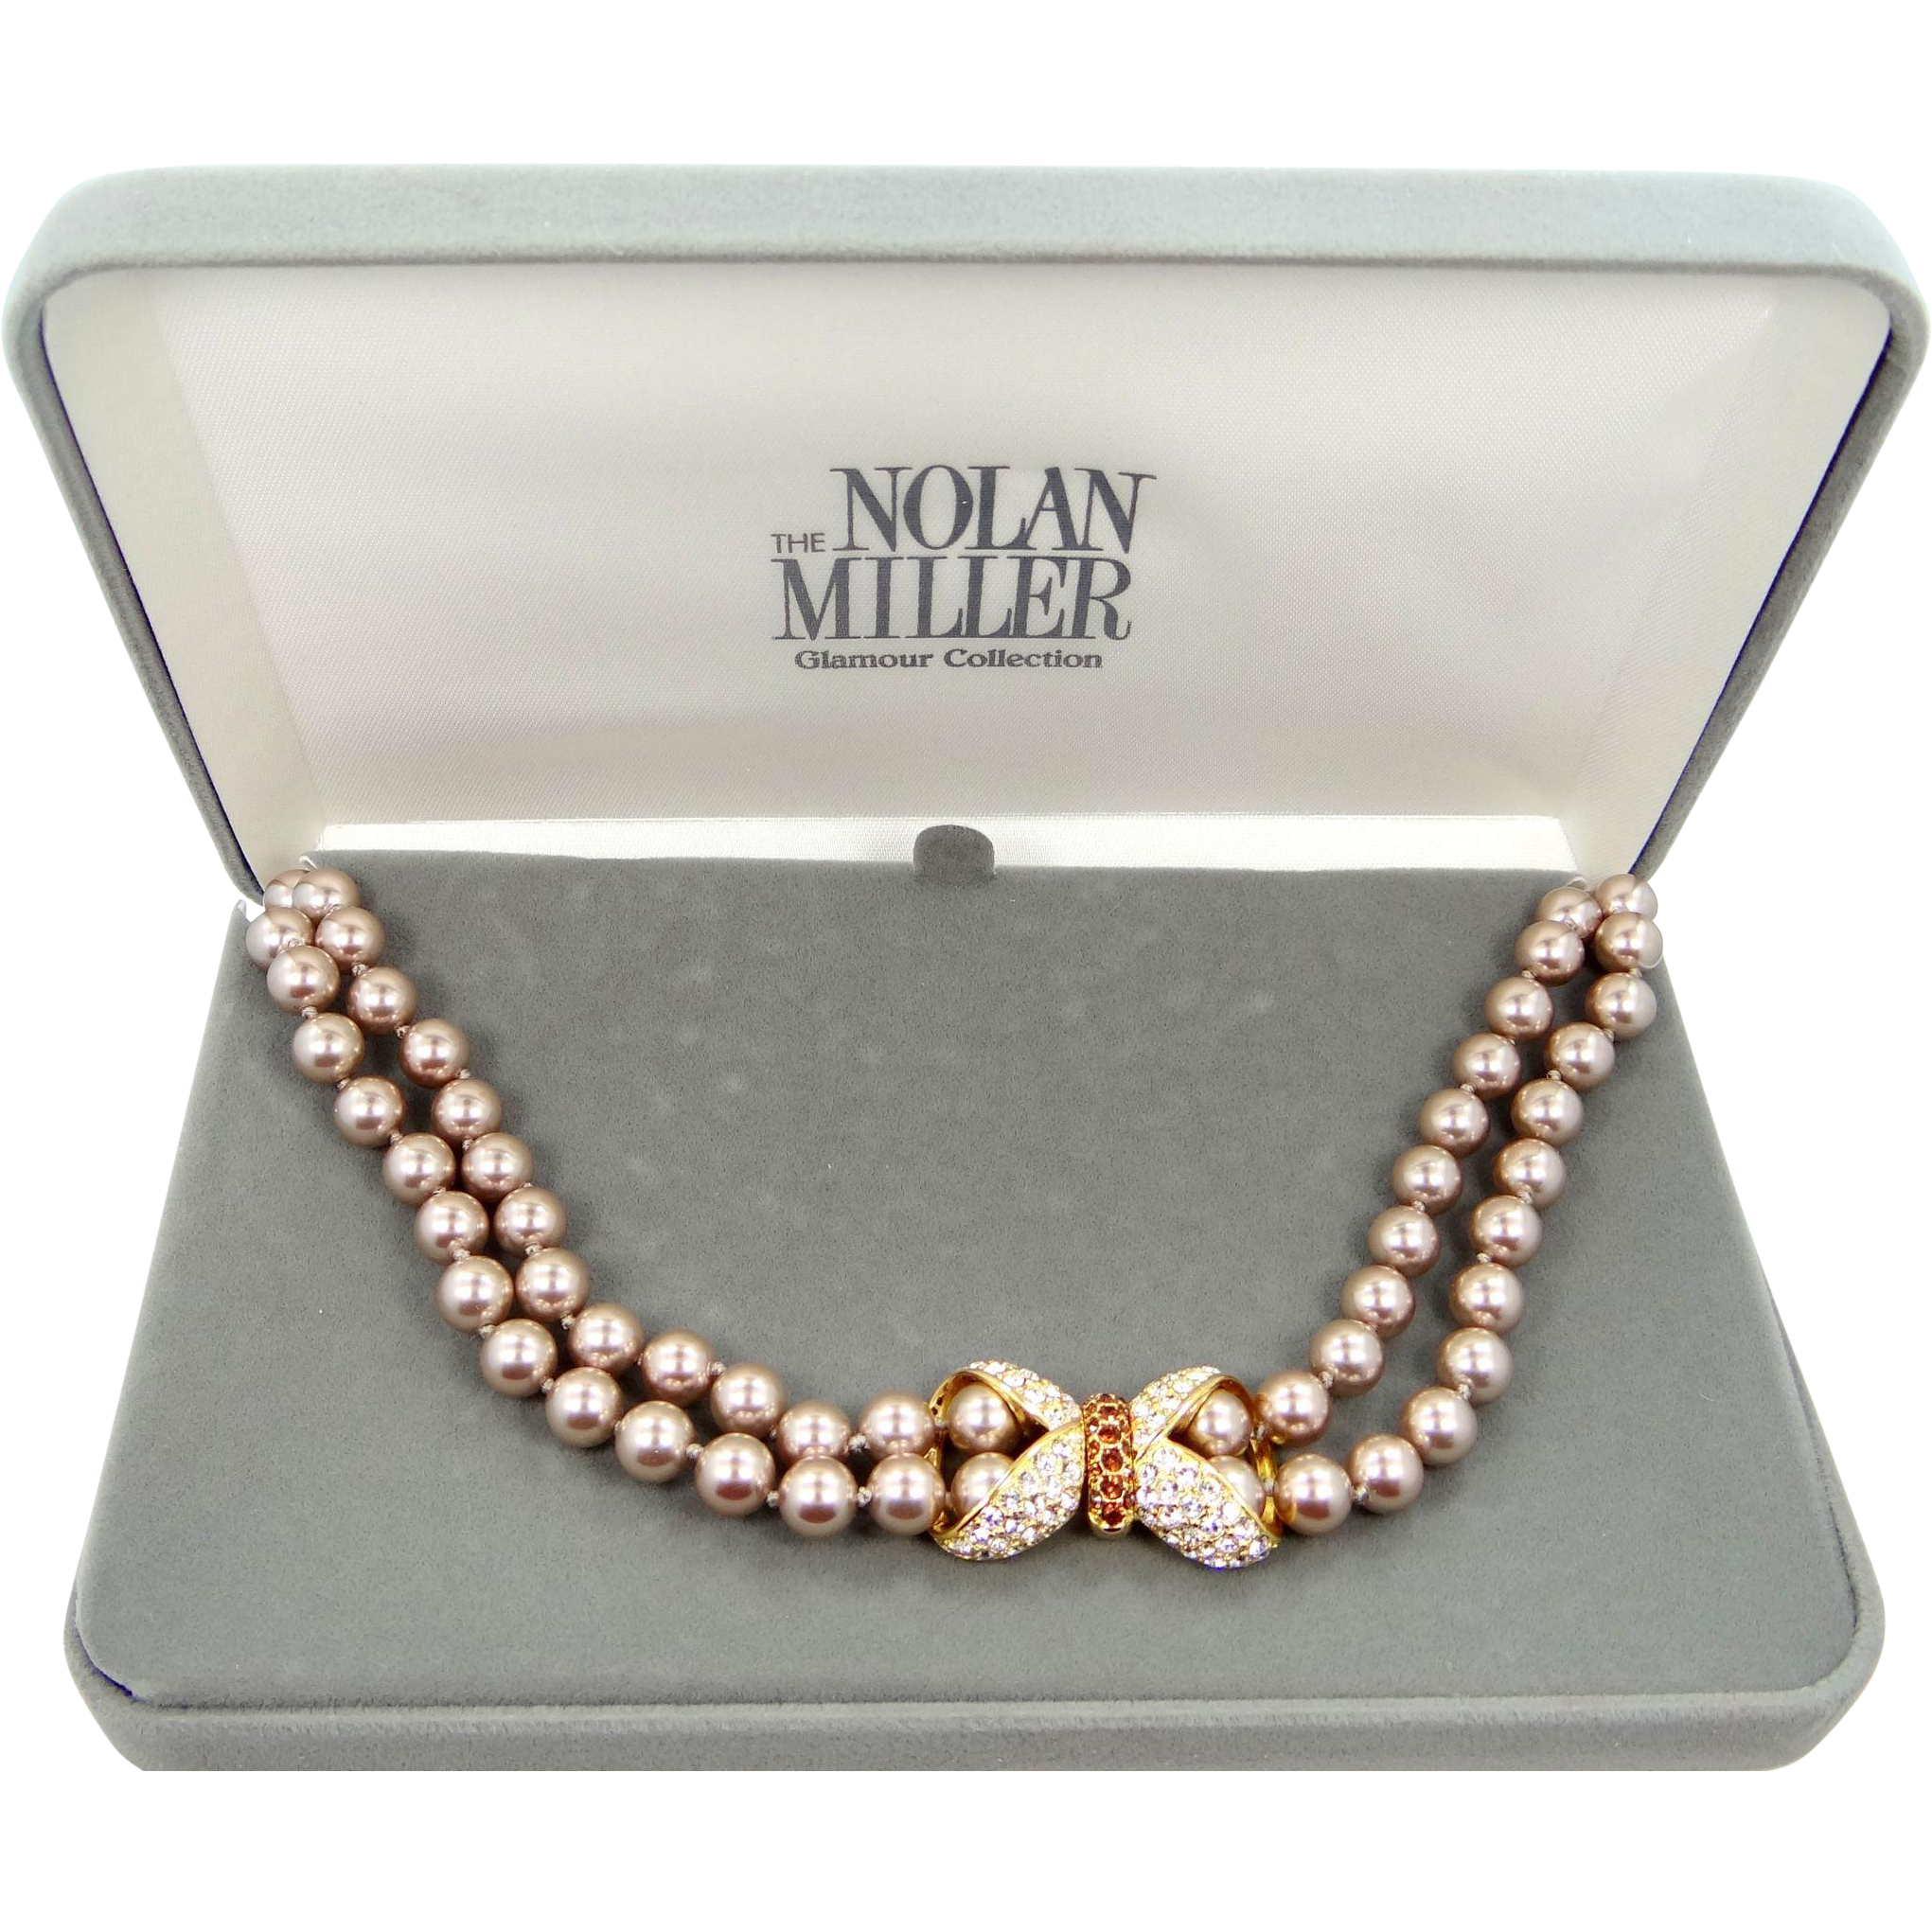 Vintage Nolan Miller Romantic Figure 8 Double Strand Faux Pearl Necklace with Box